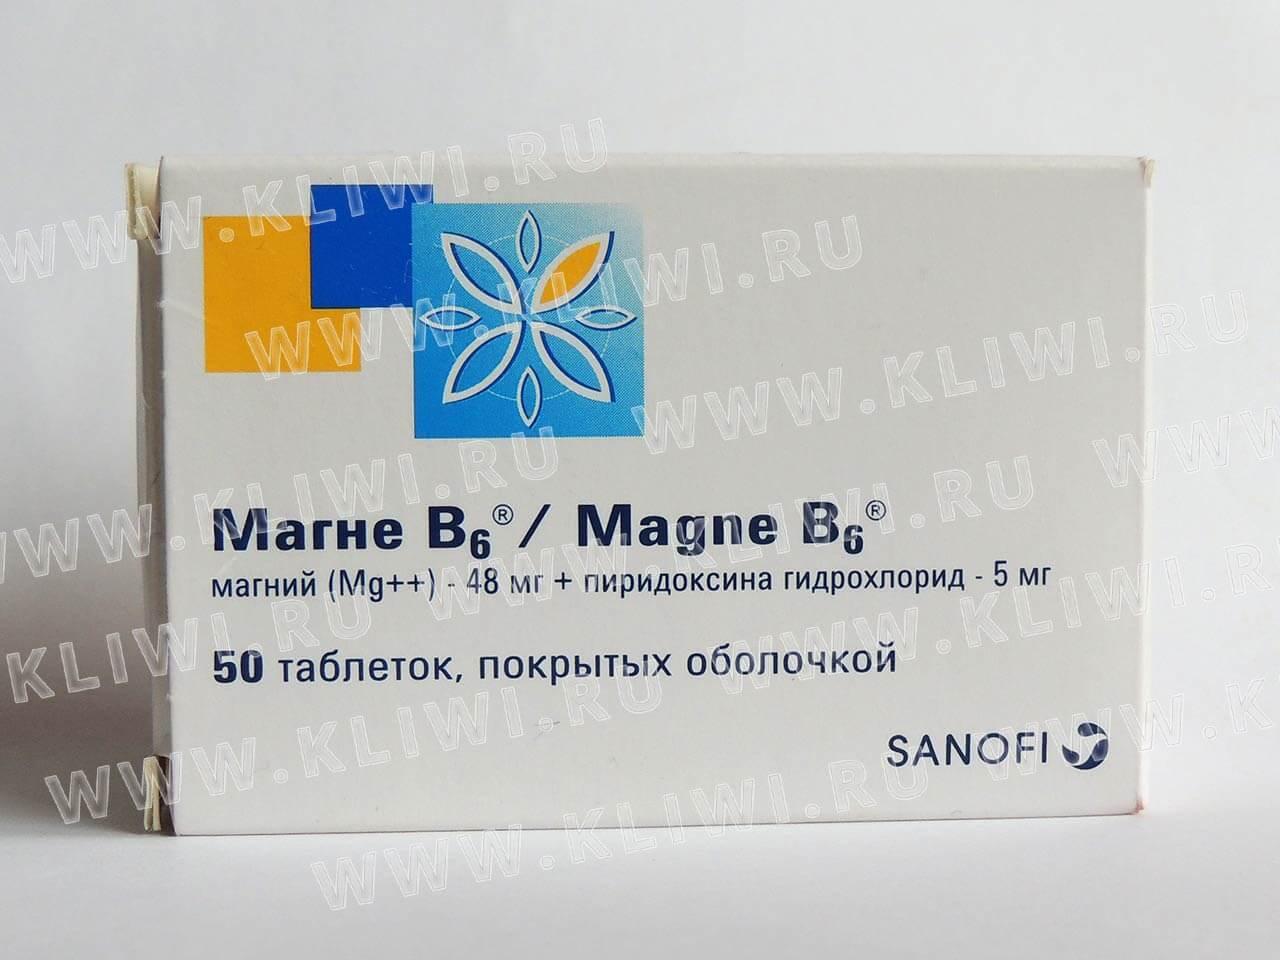 hipertenzija ir magne b6)